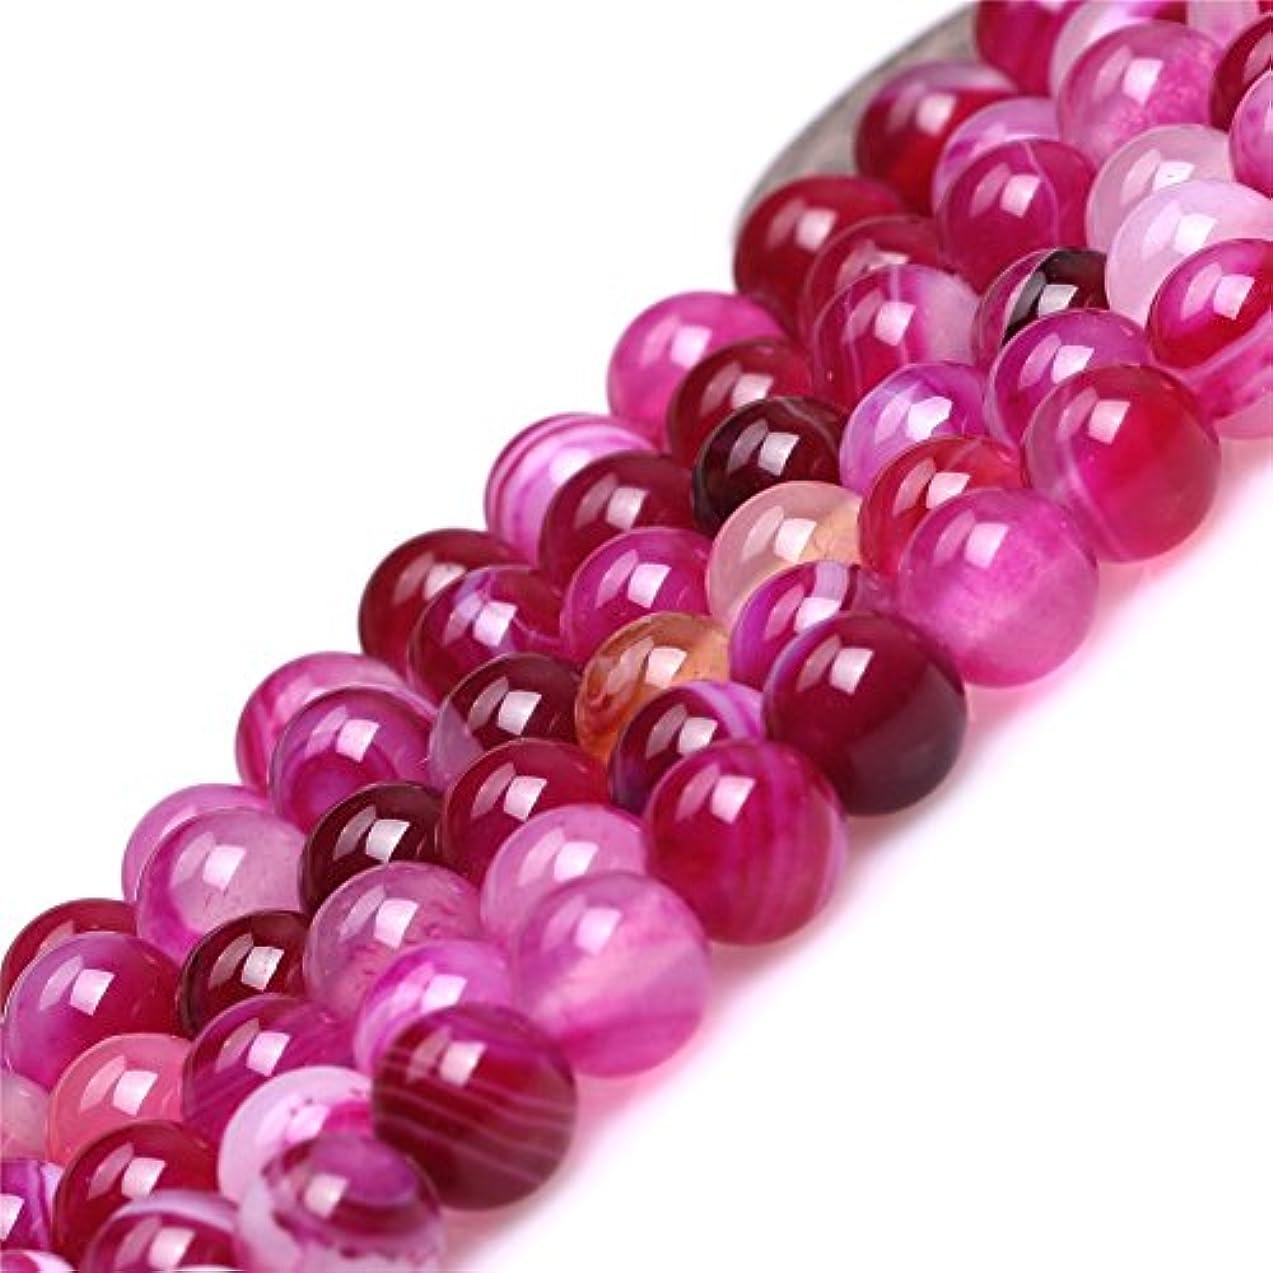 Stripe Plum Agate Beads for Jewelry Making Gemstone Semi Precious 6mm Round 15